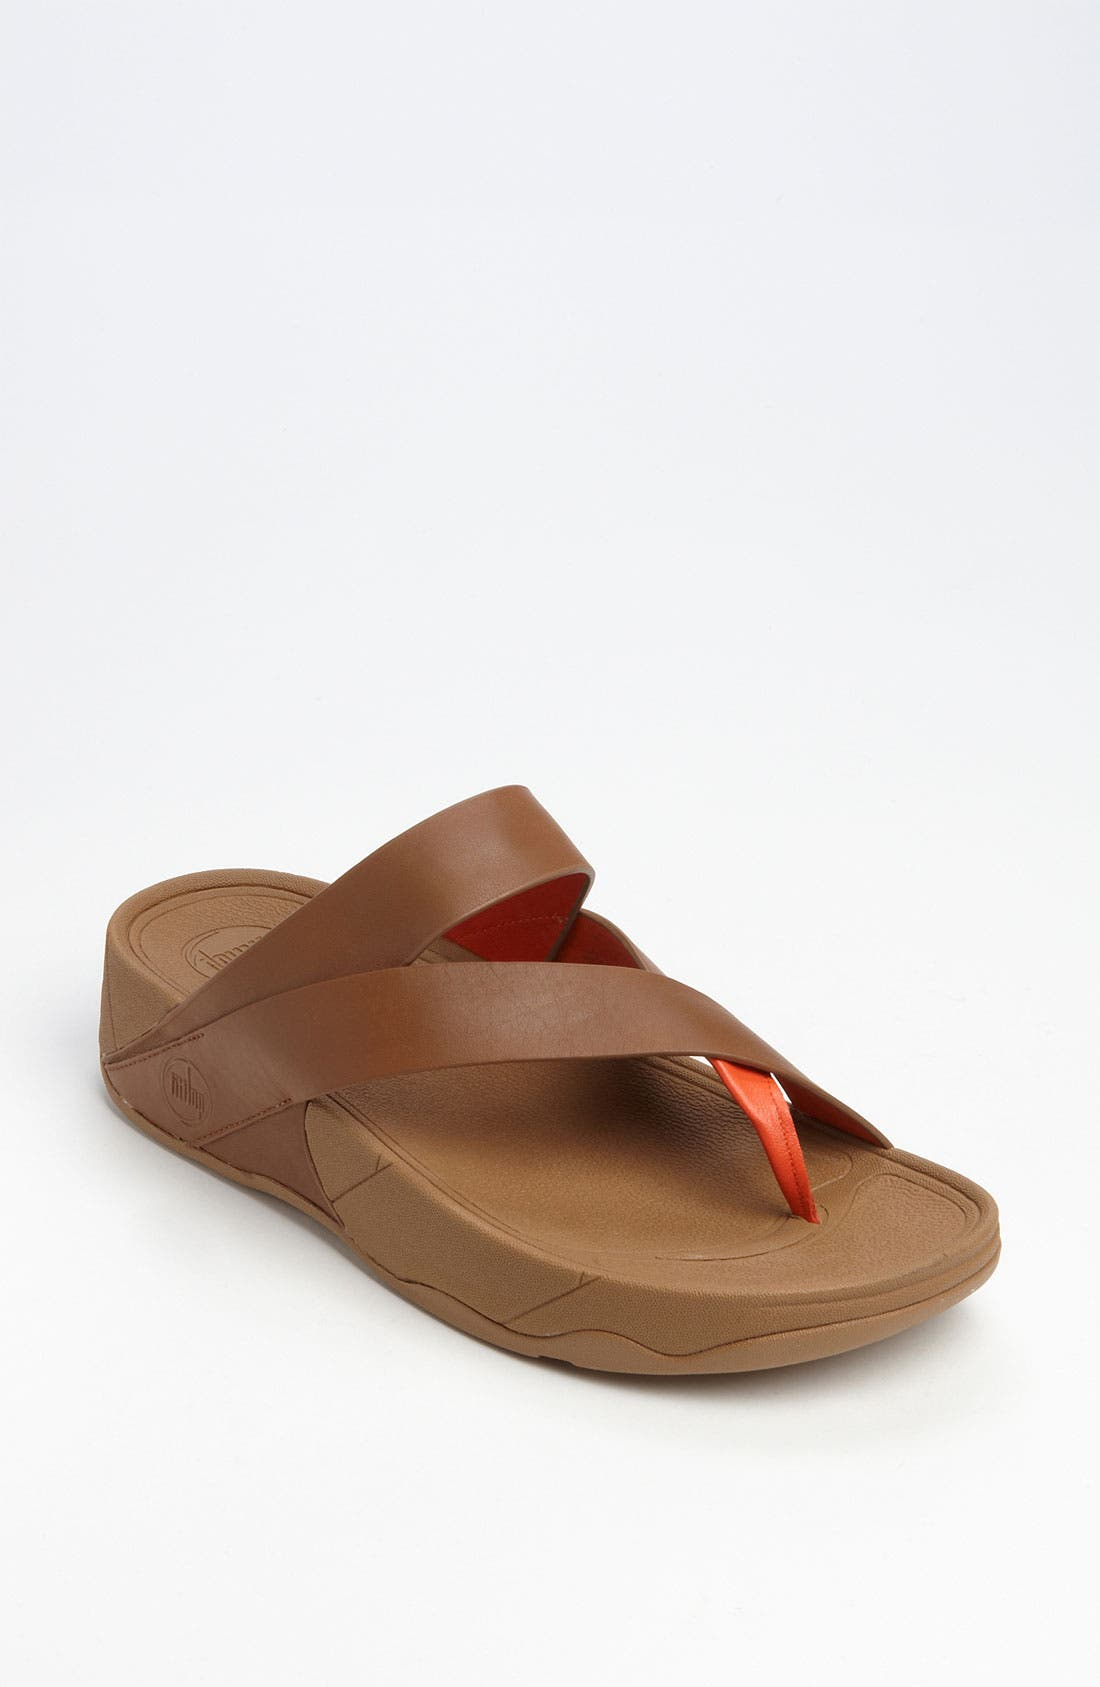 Alternate Image 1 Selected - FitFlop Sling Sandal (Women)